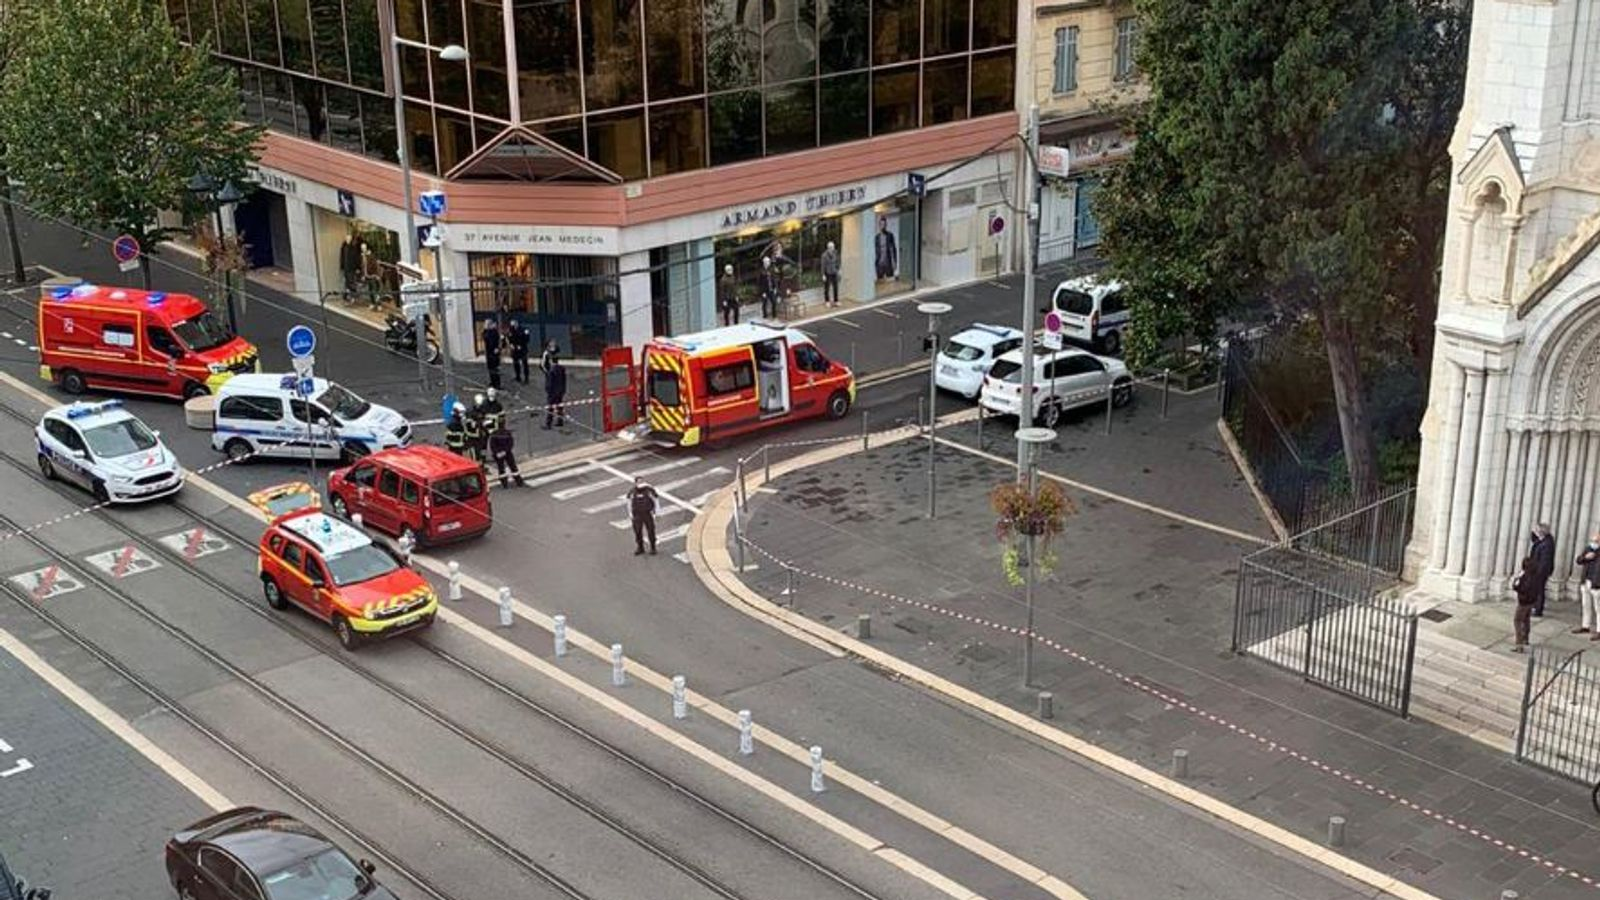 Two dead in 'suspected terror attack' in Nice